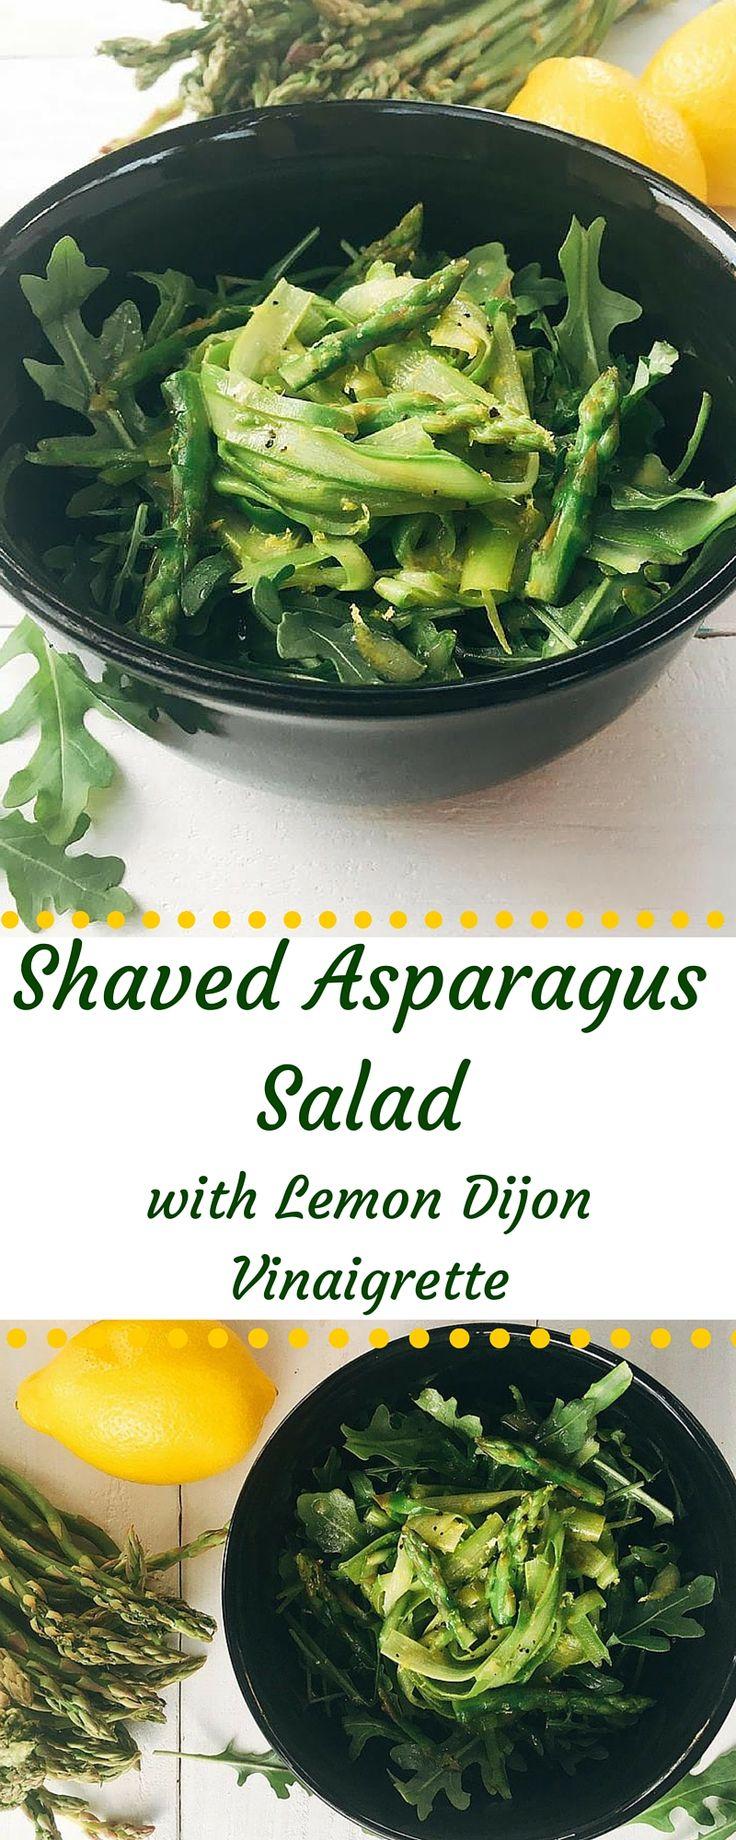 25+ best ideas about Asparagus Salad on Pinterest | Salat ...